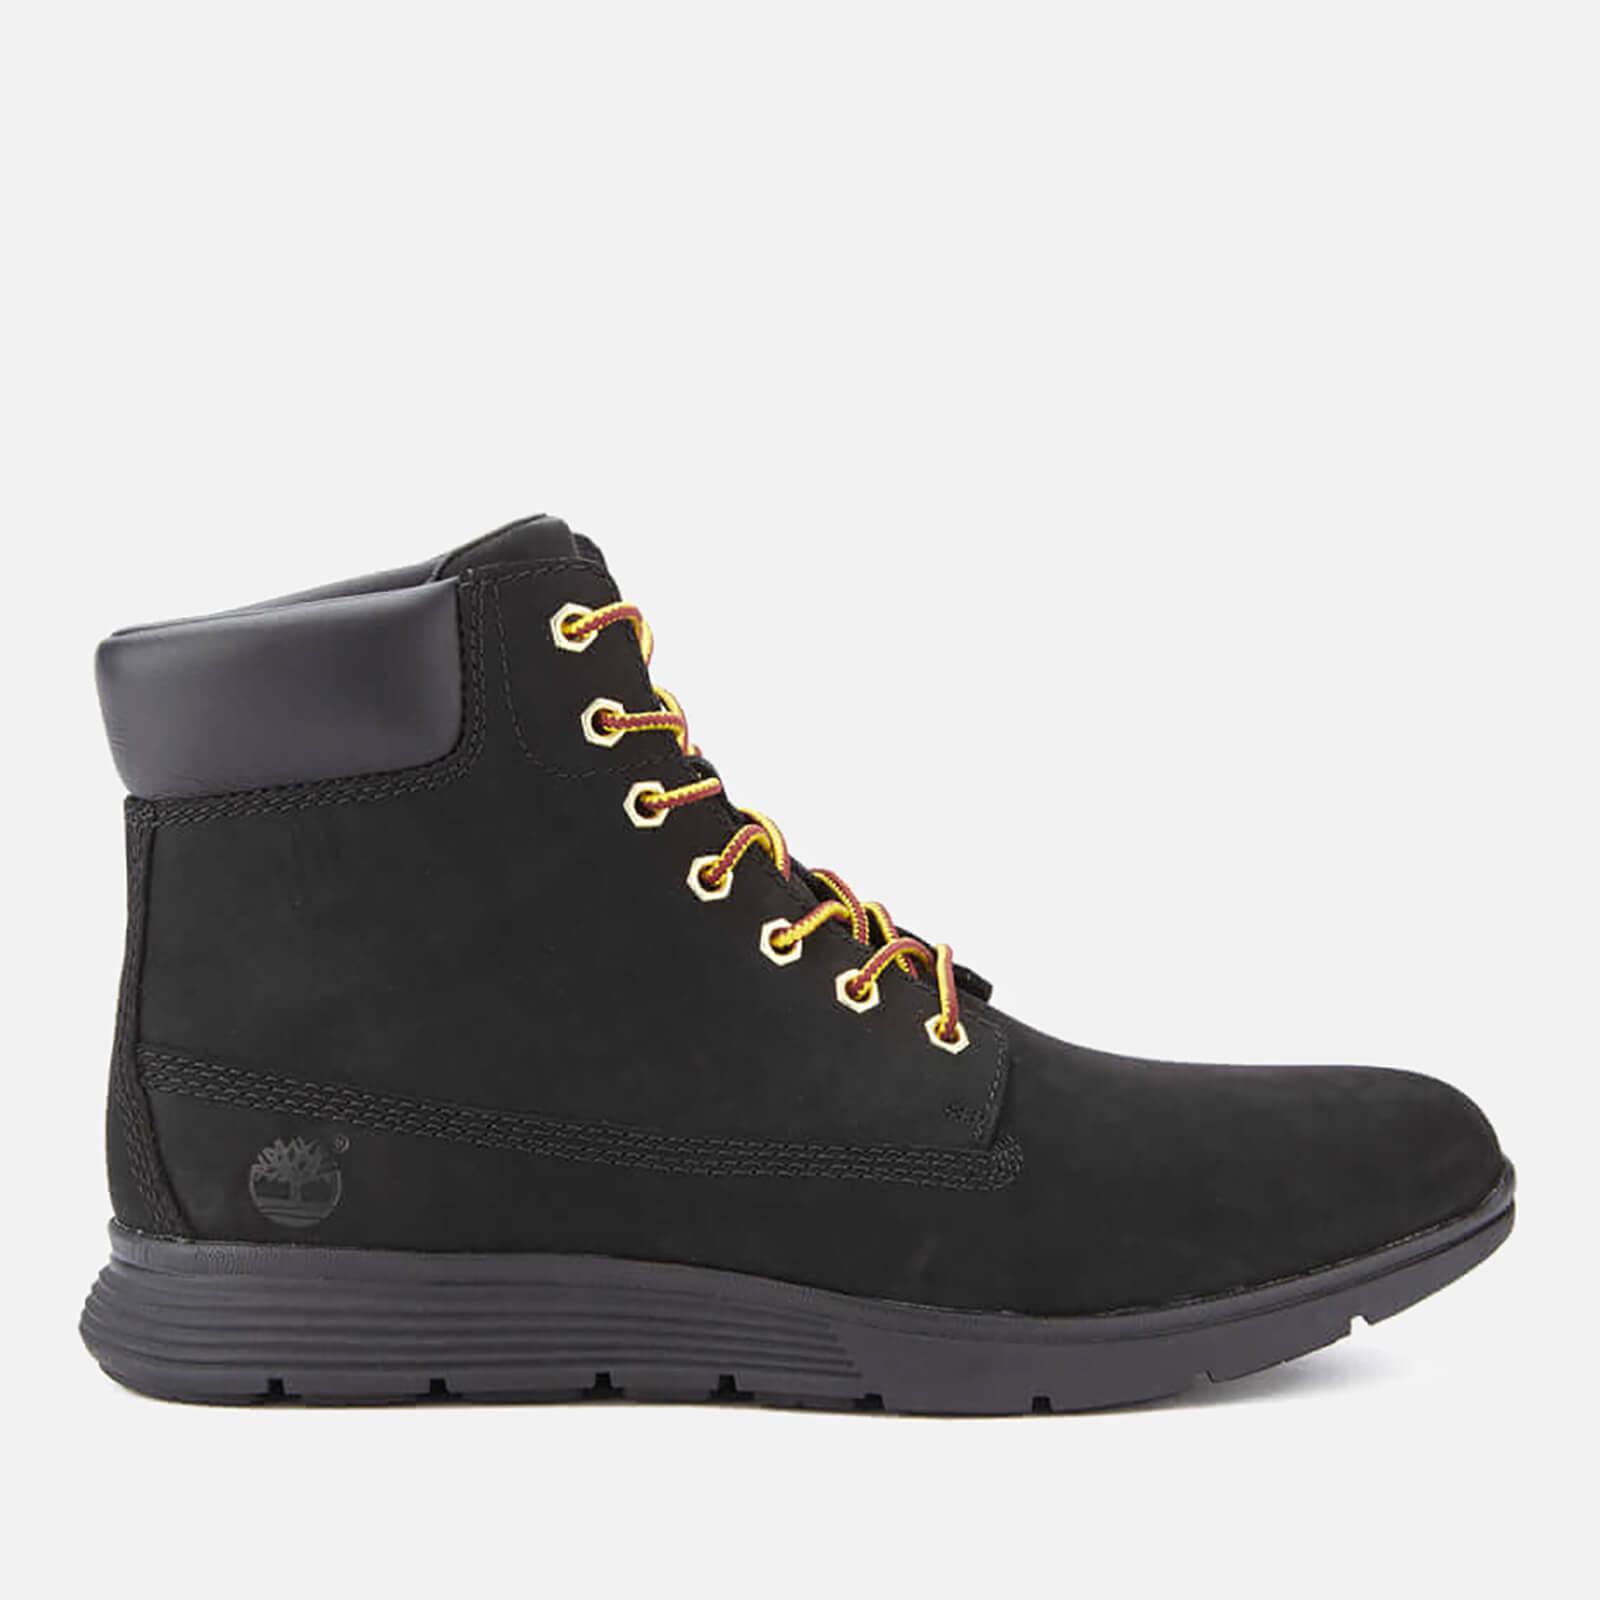 Timberland Men s Killington 6 Inch Boots - Black Nubuck  a8929ec2dbd1